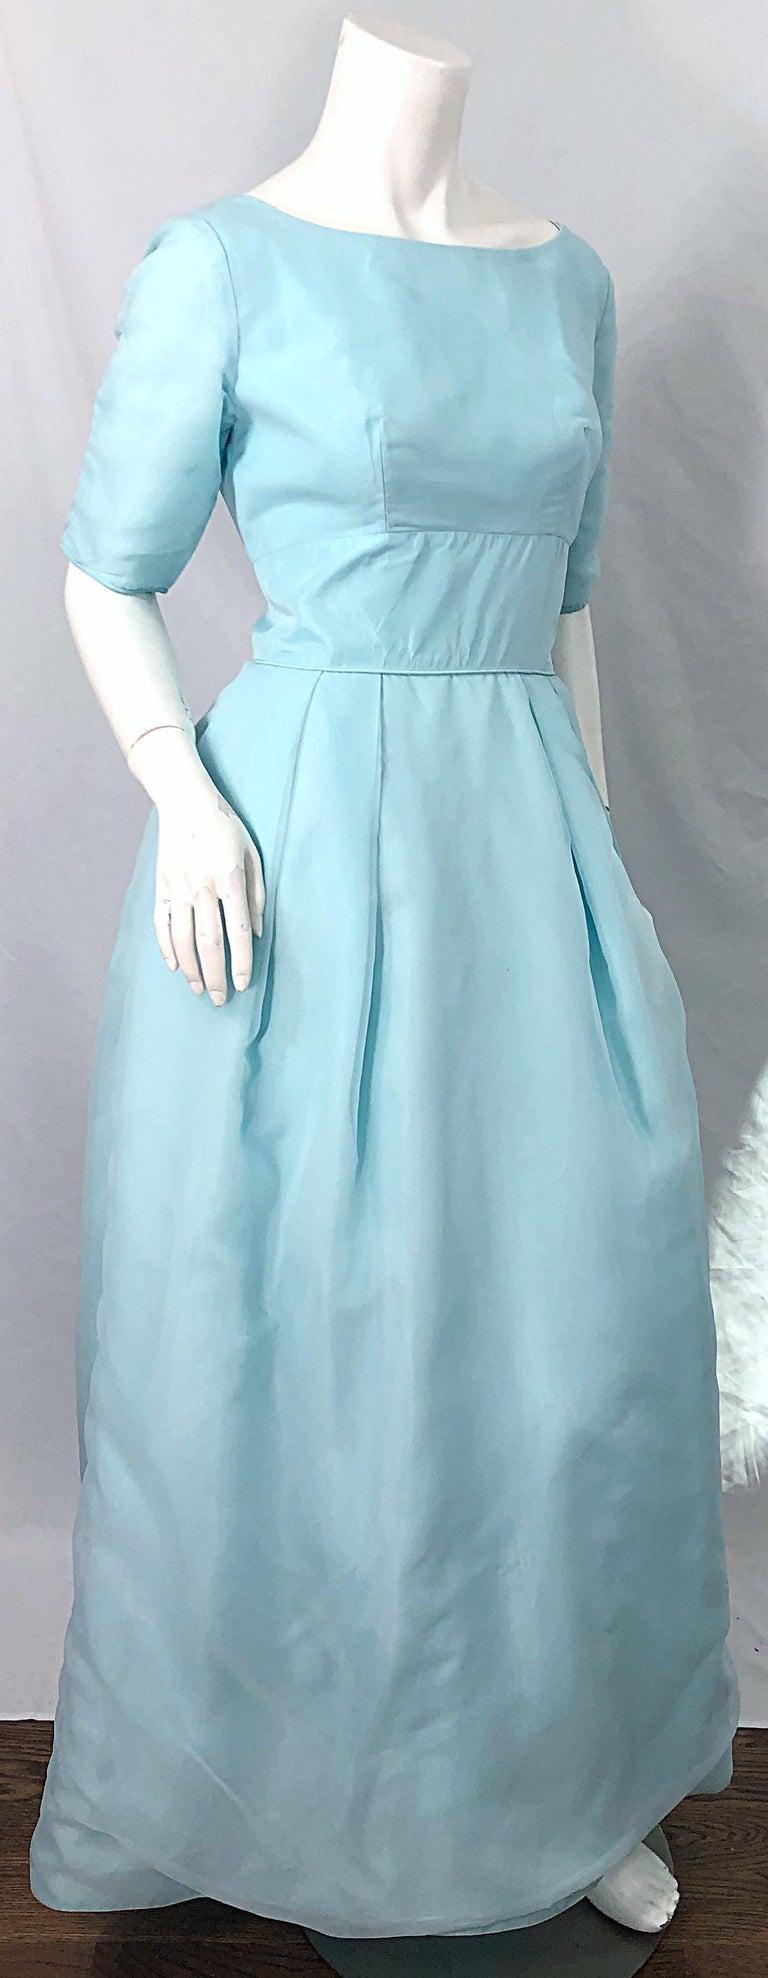 1950s Demi Couture Light Blue Cinderella Silk Chiffon Taffeta 3/4 Sleeves Gown For Sale 3